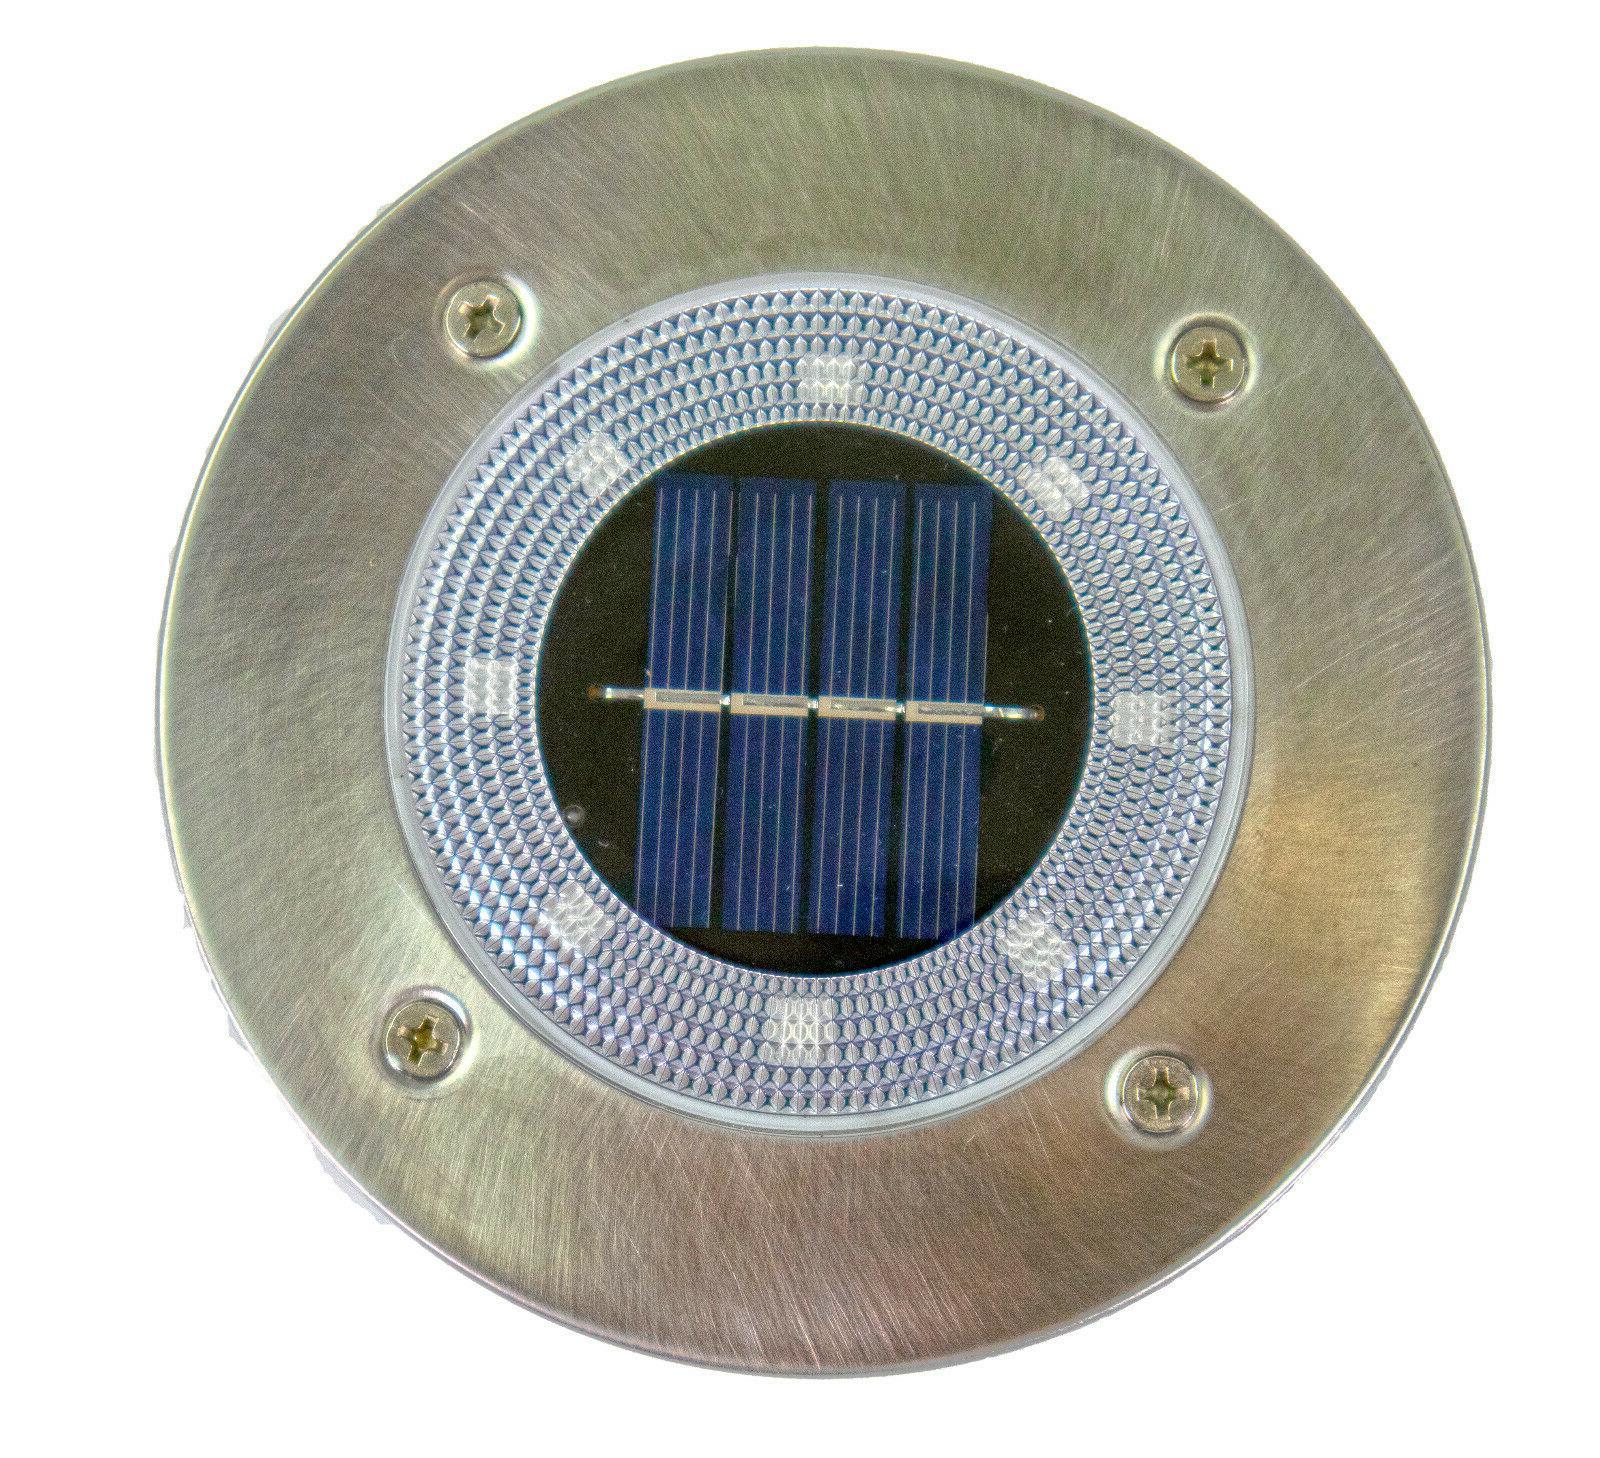 LED Lights Waterproof Disk